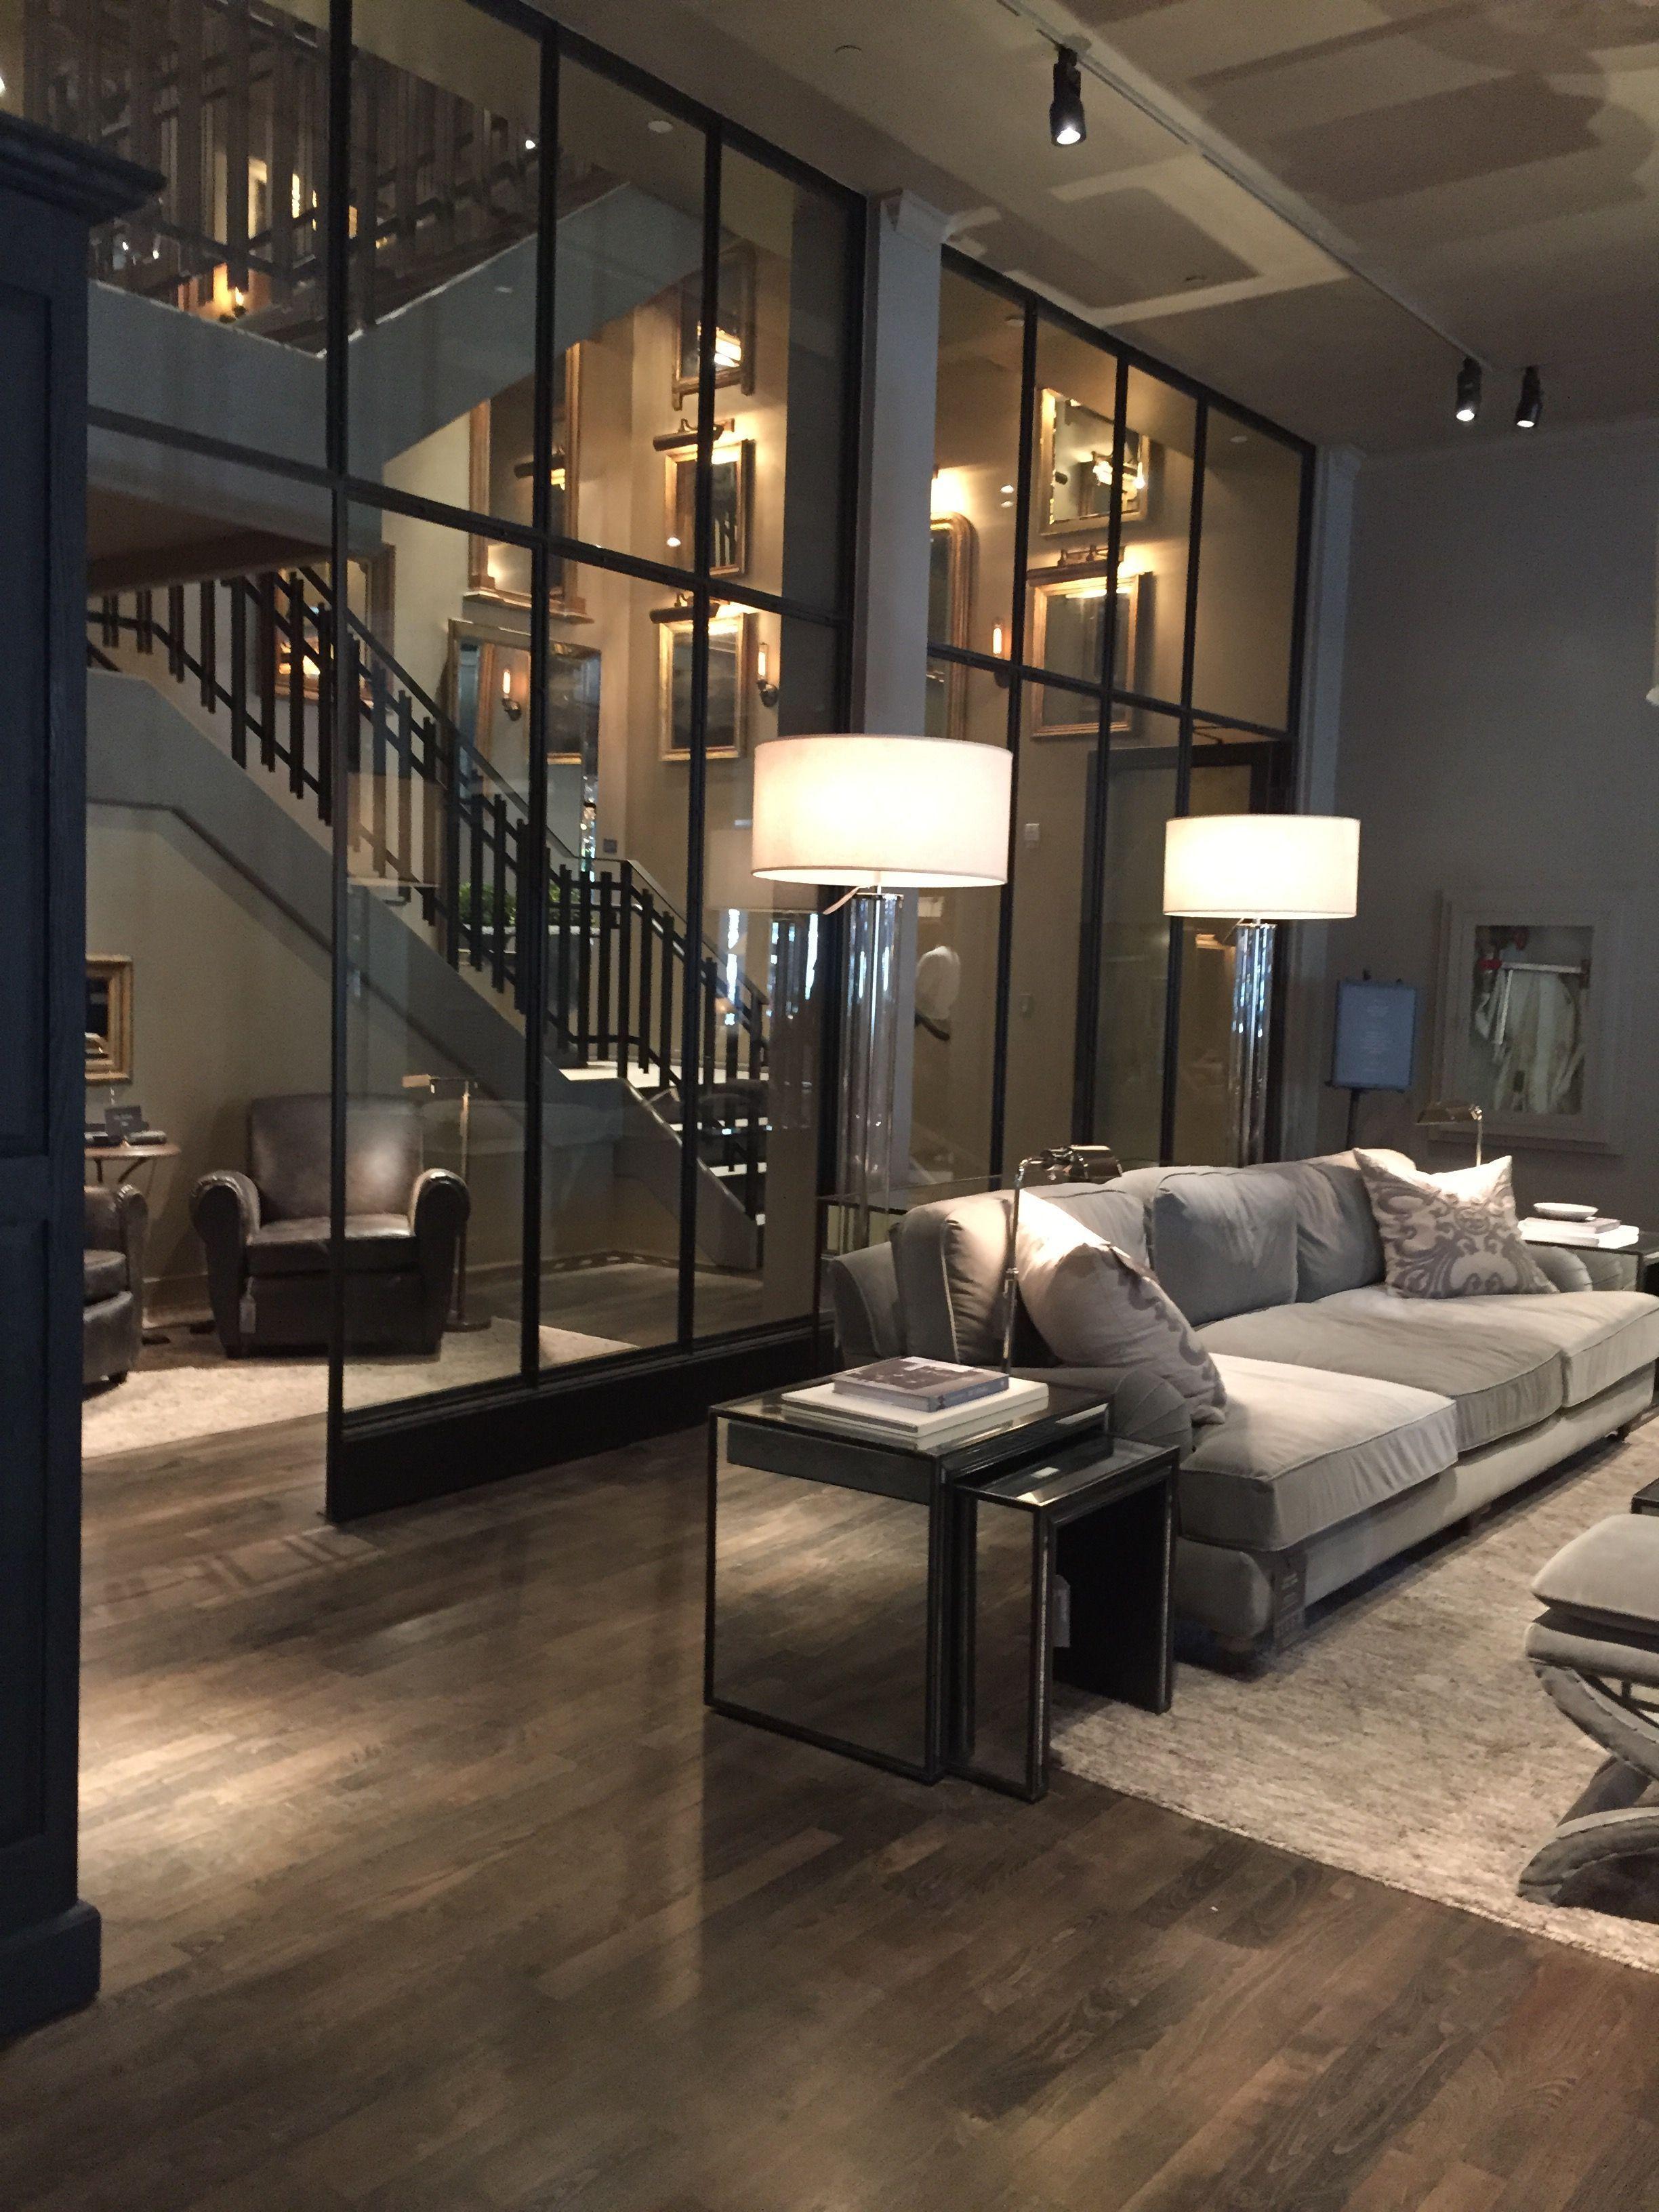 Amazing Contemporary Interior Design 2019 34 Contemporary Kitchen Decor Black Living Room Home Interior Design,Flower Engagement Decoration Ideas At Home